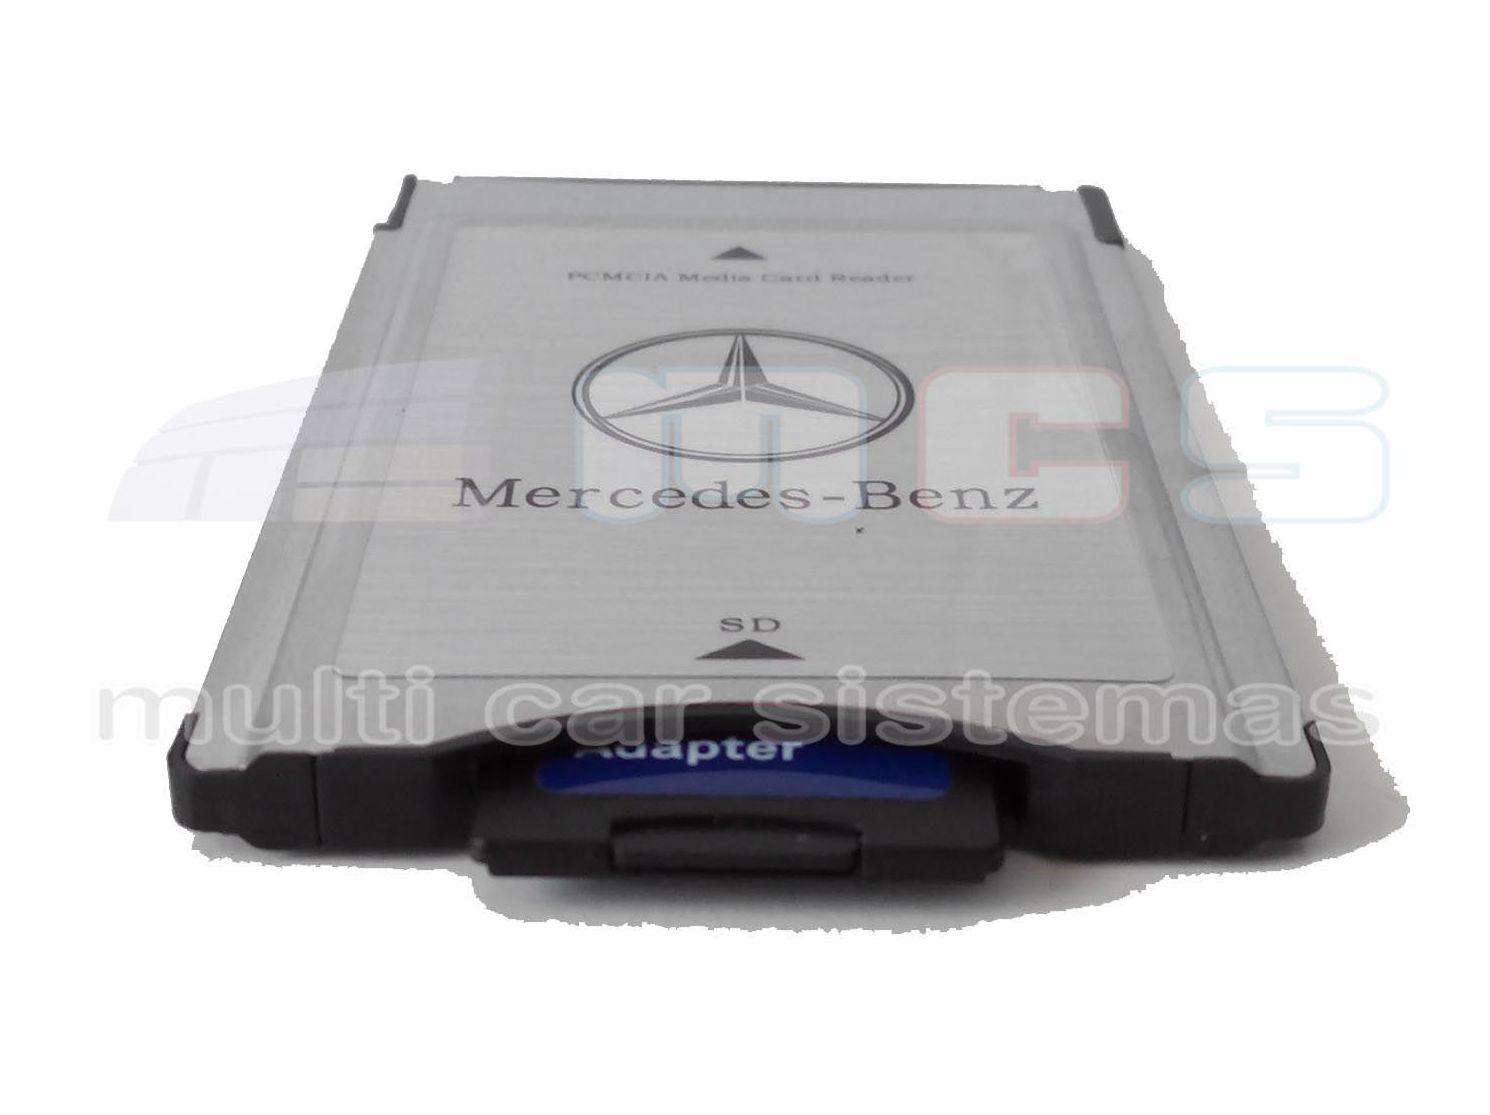 Adaptador pcmcia tarjeta sd mercedes benz for Pcmcia mercedes benz